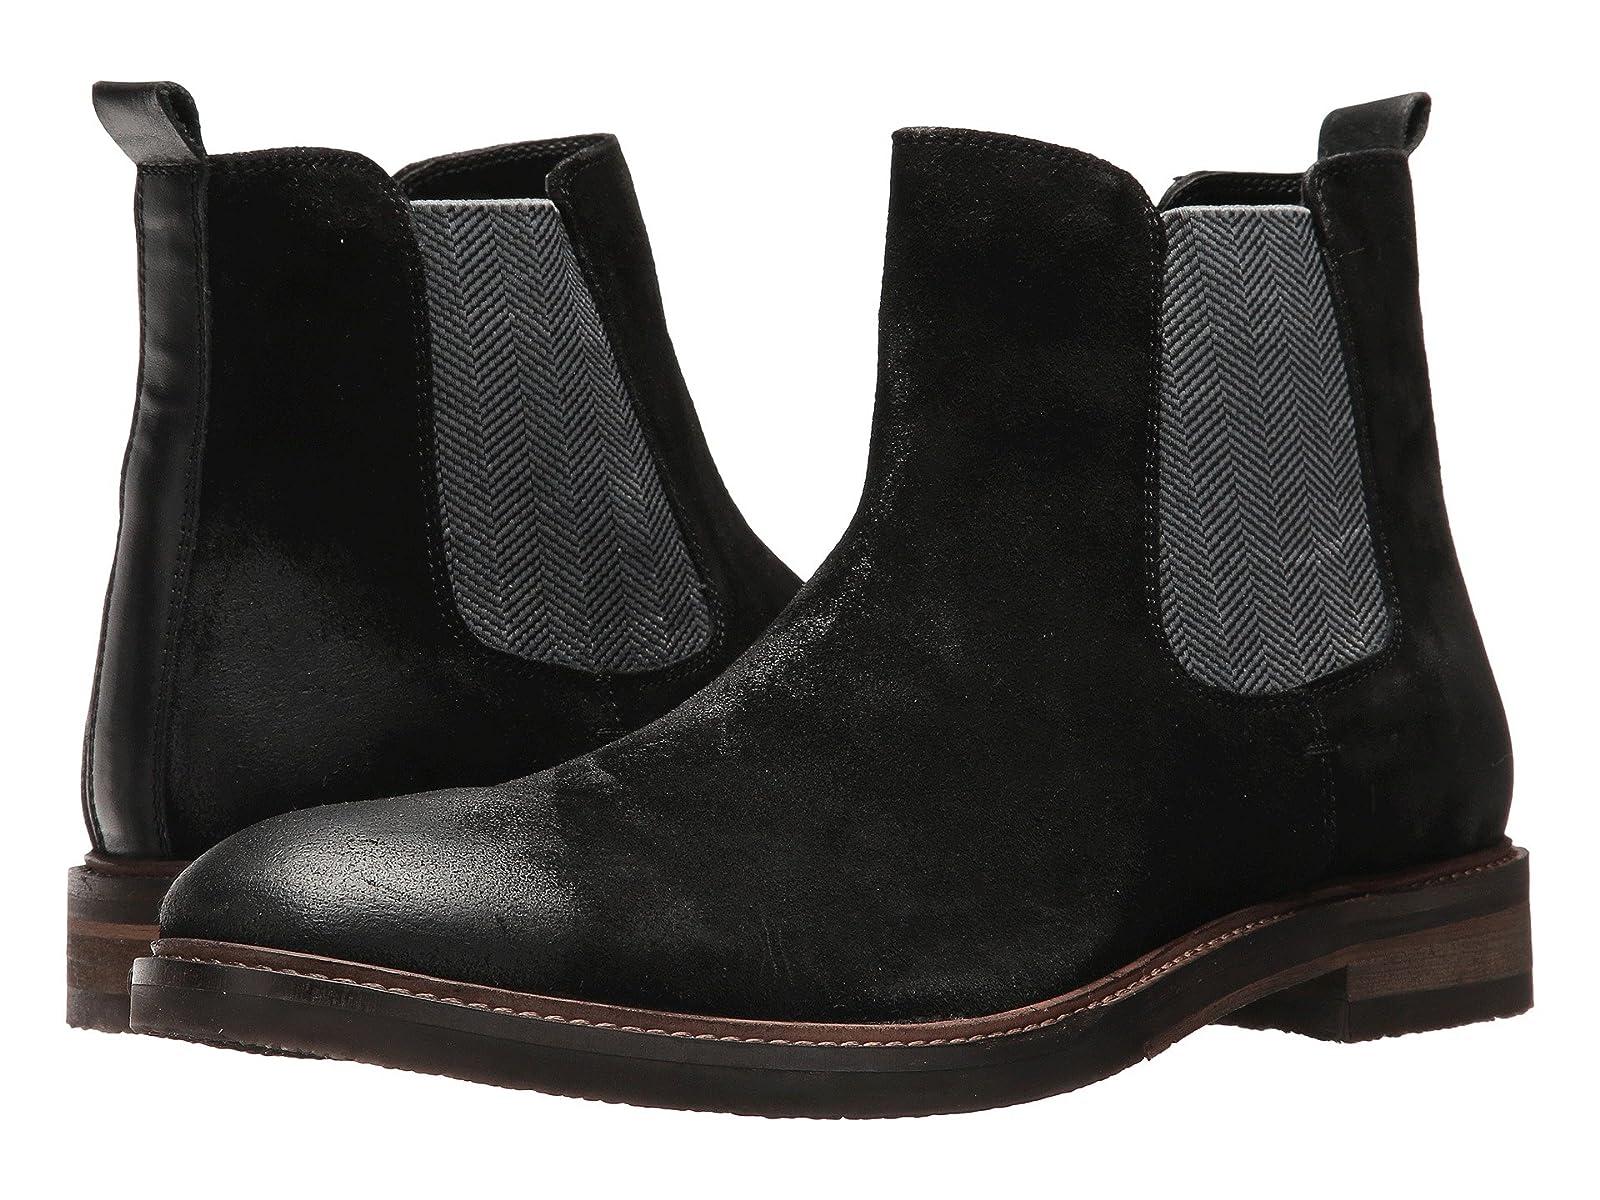 Steve Madden TellerCheap and distinctive eye-catching shoes